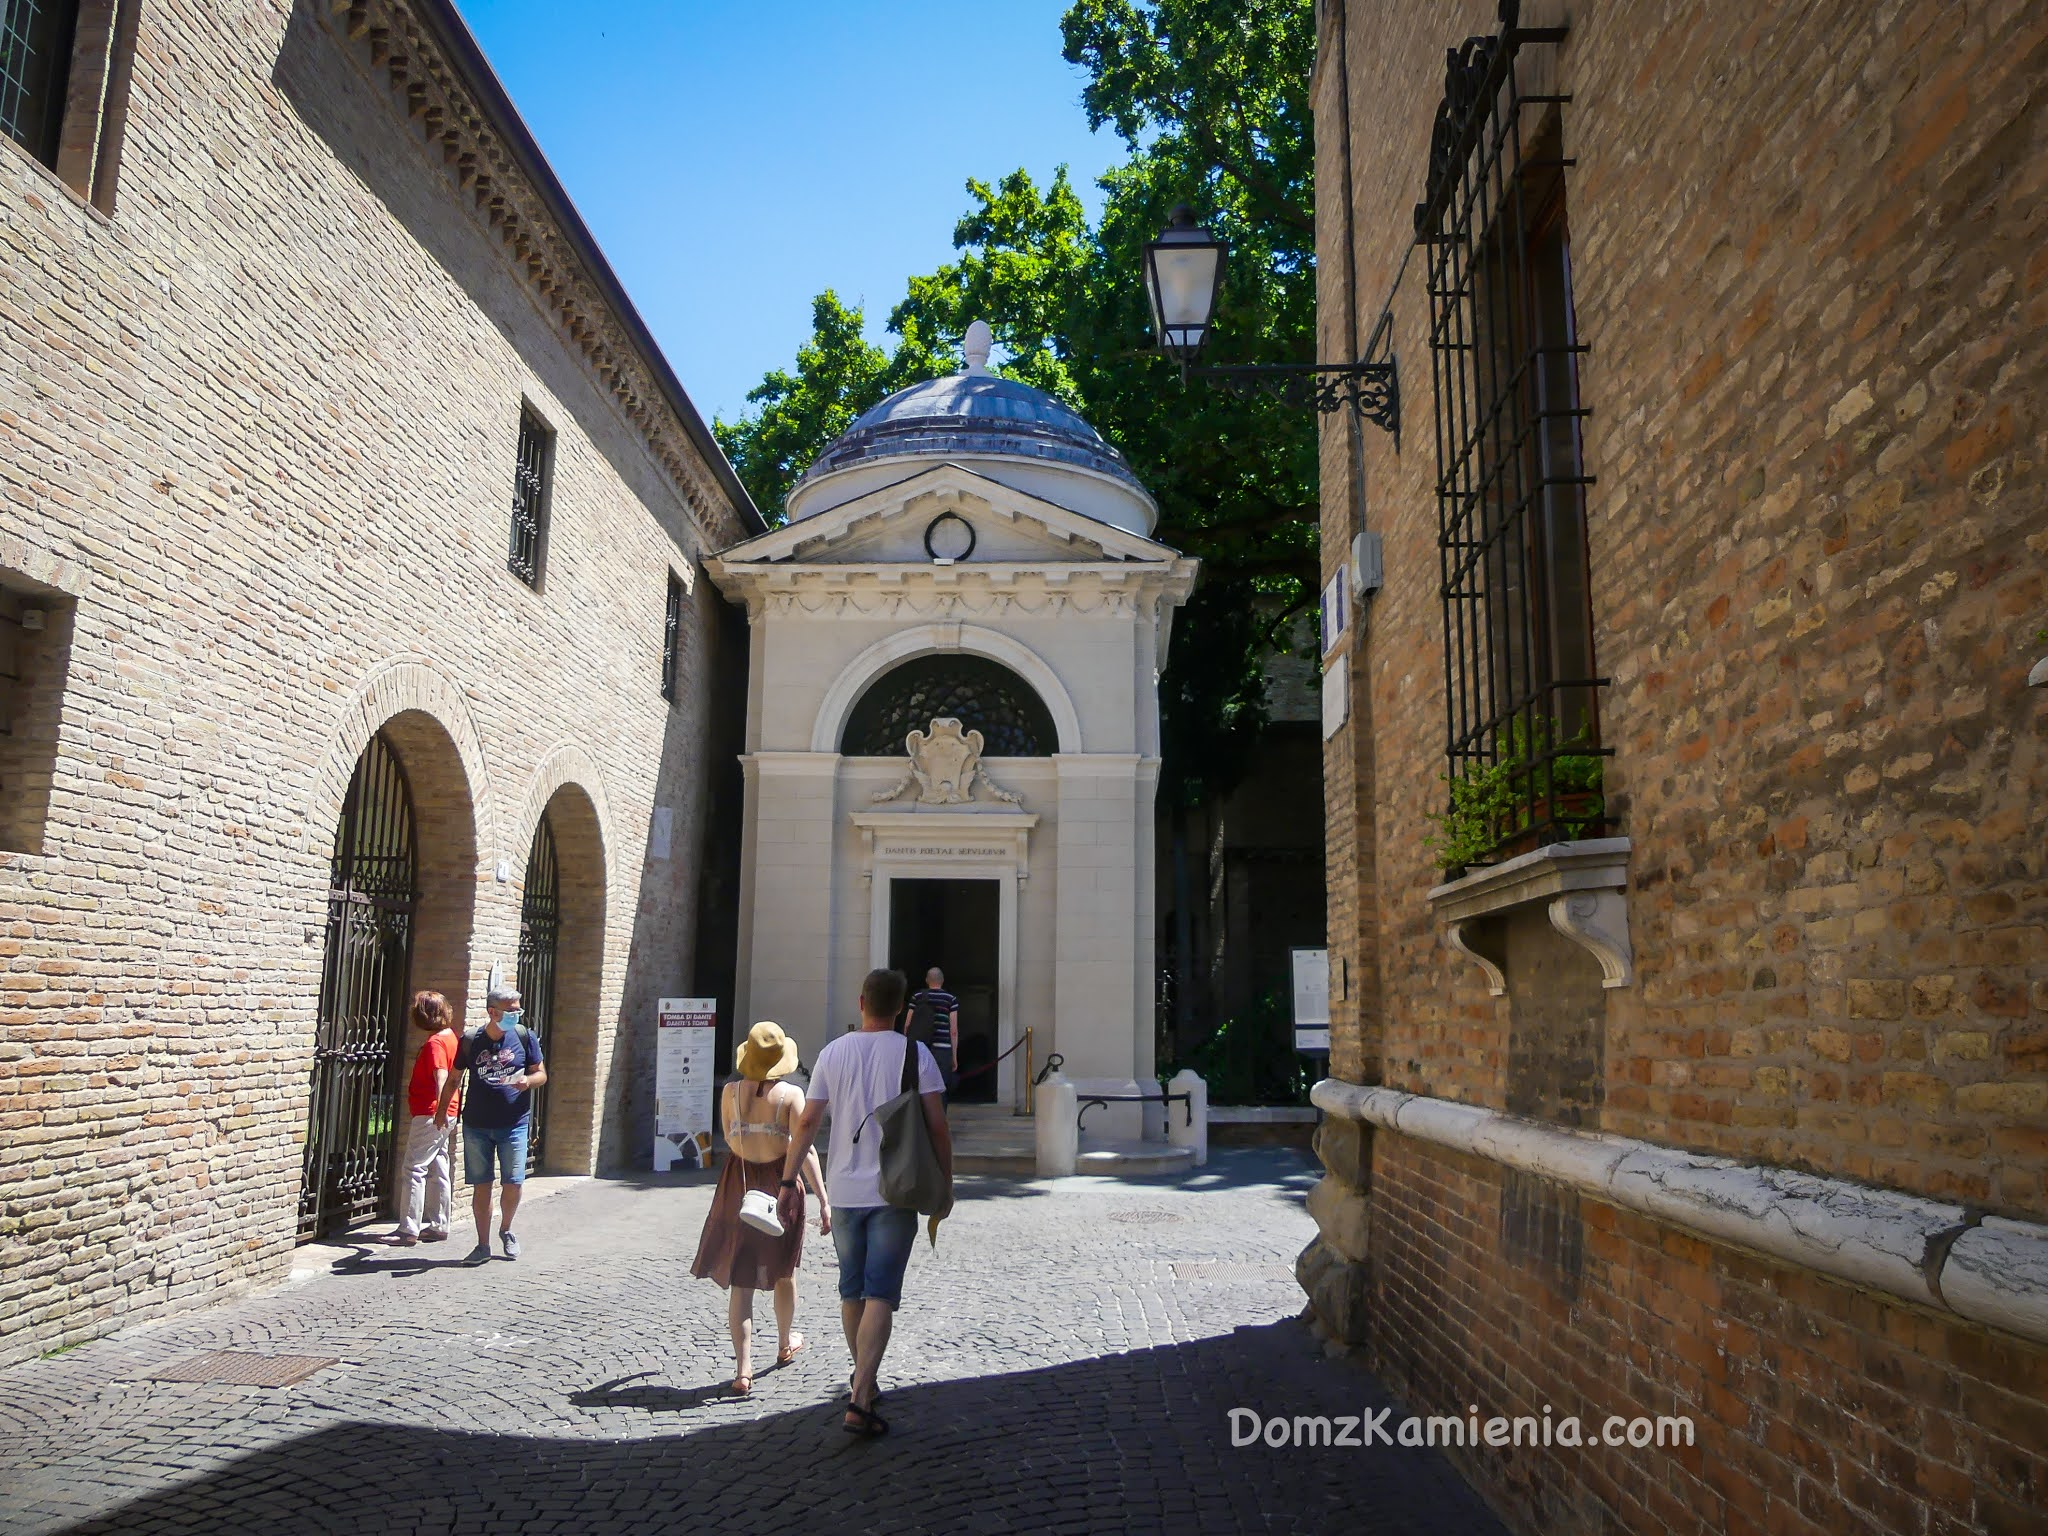 Ravenna Dom z Kamienia